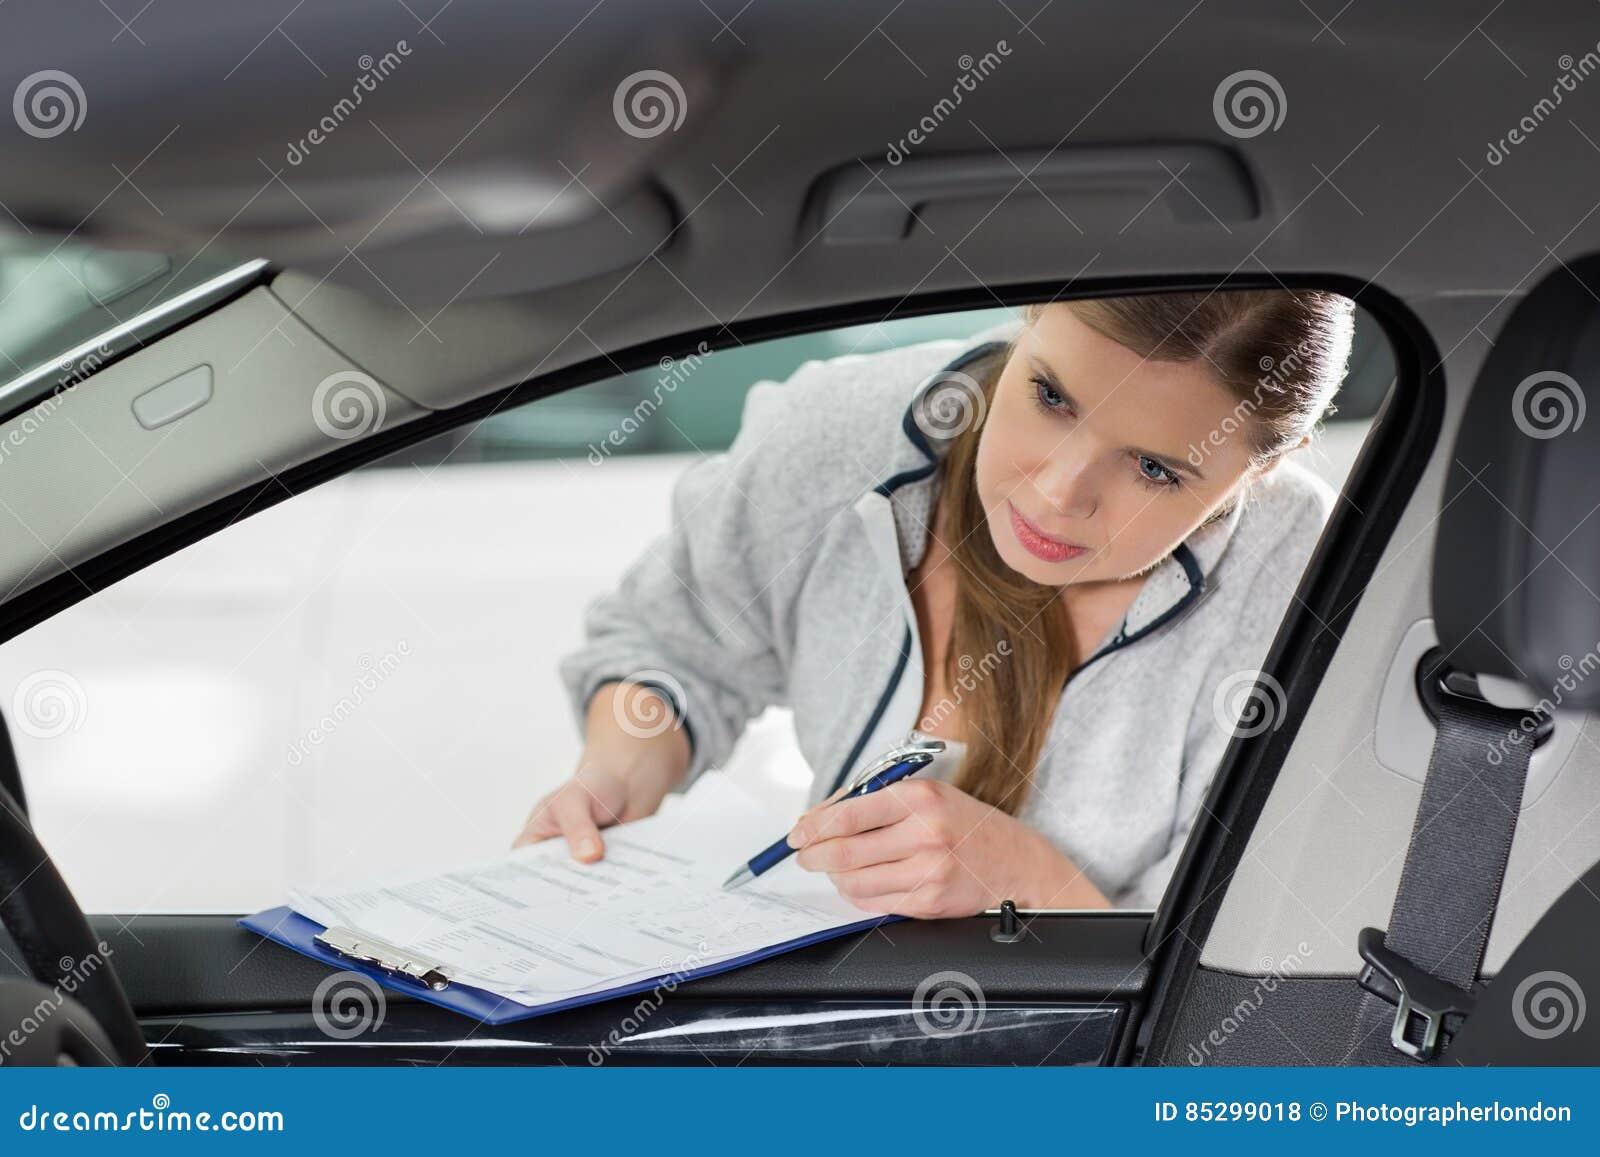 Car interior maintenance - Car Clipboard Engineer Female Interior Maintenance